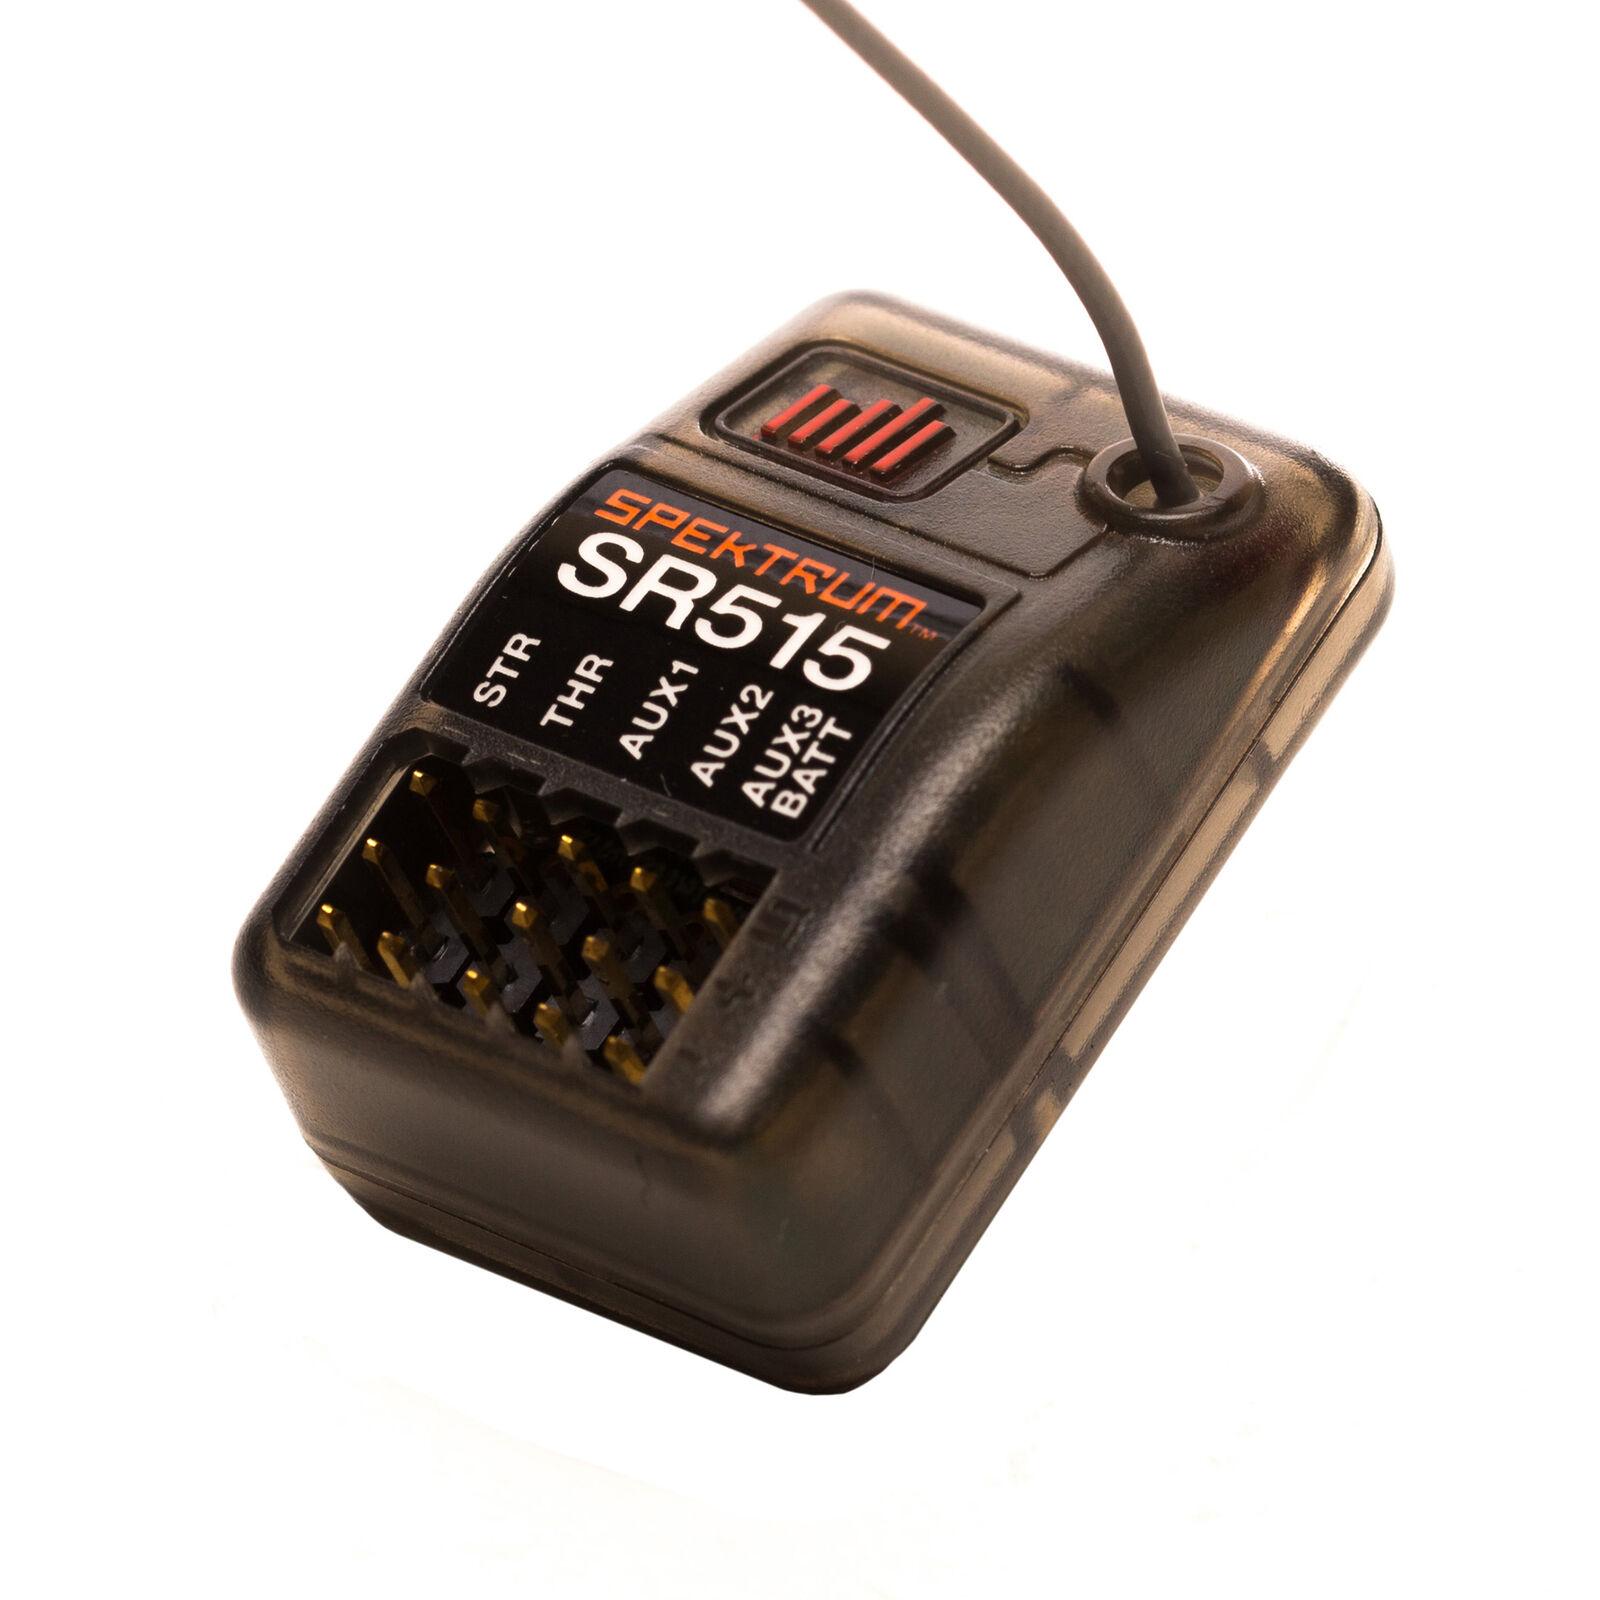 SR515 DSMR 5-Channel Sport Receiver